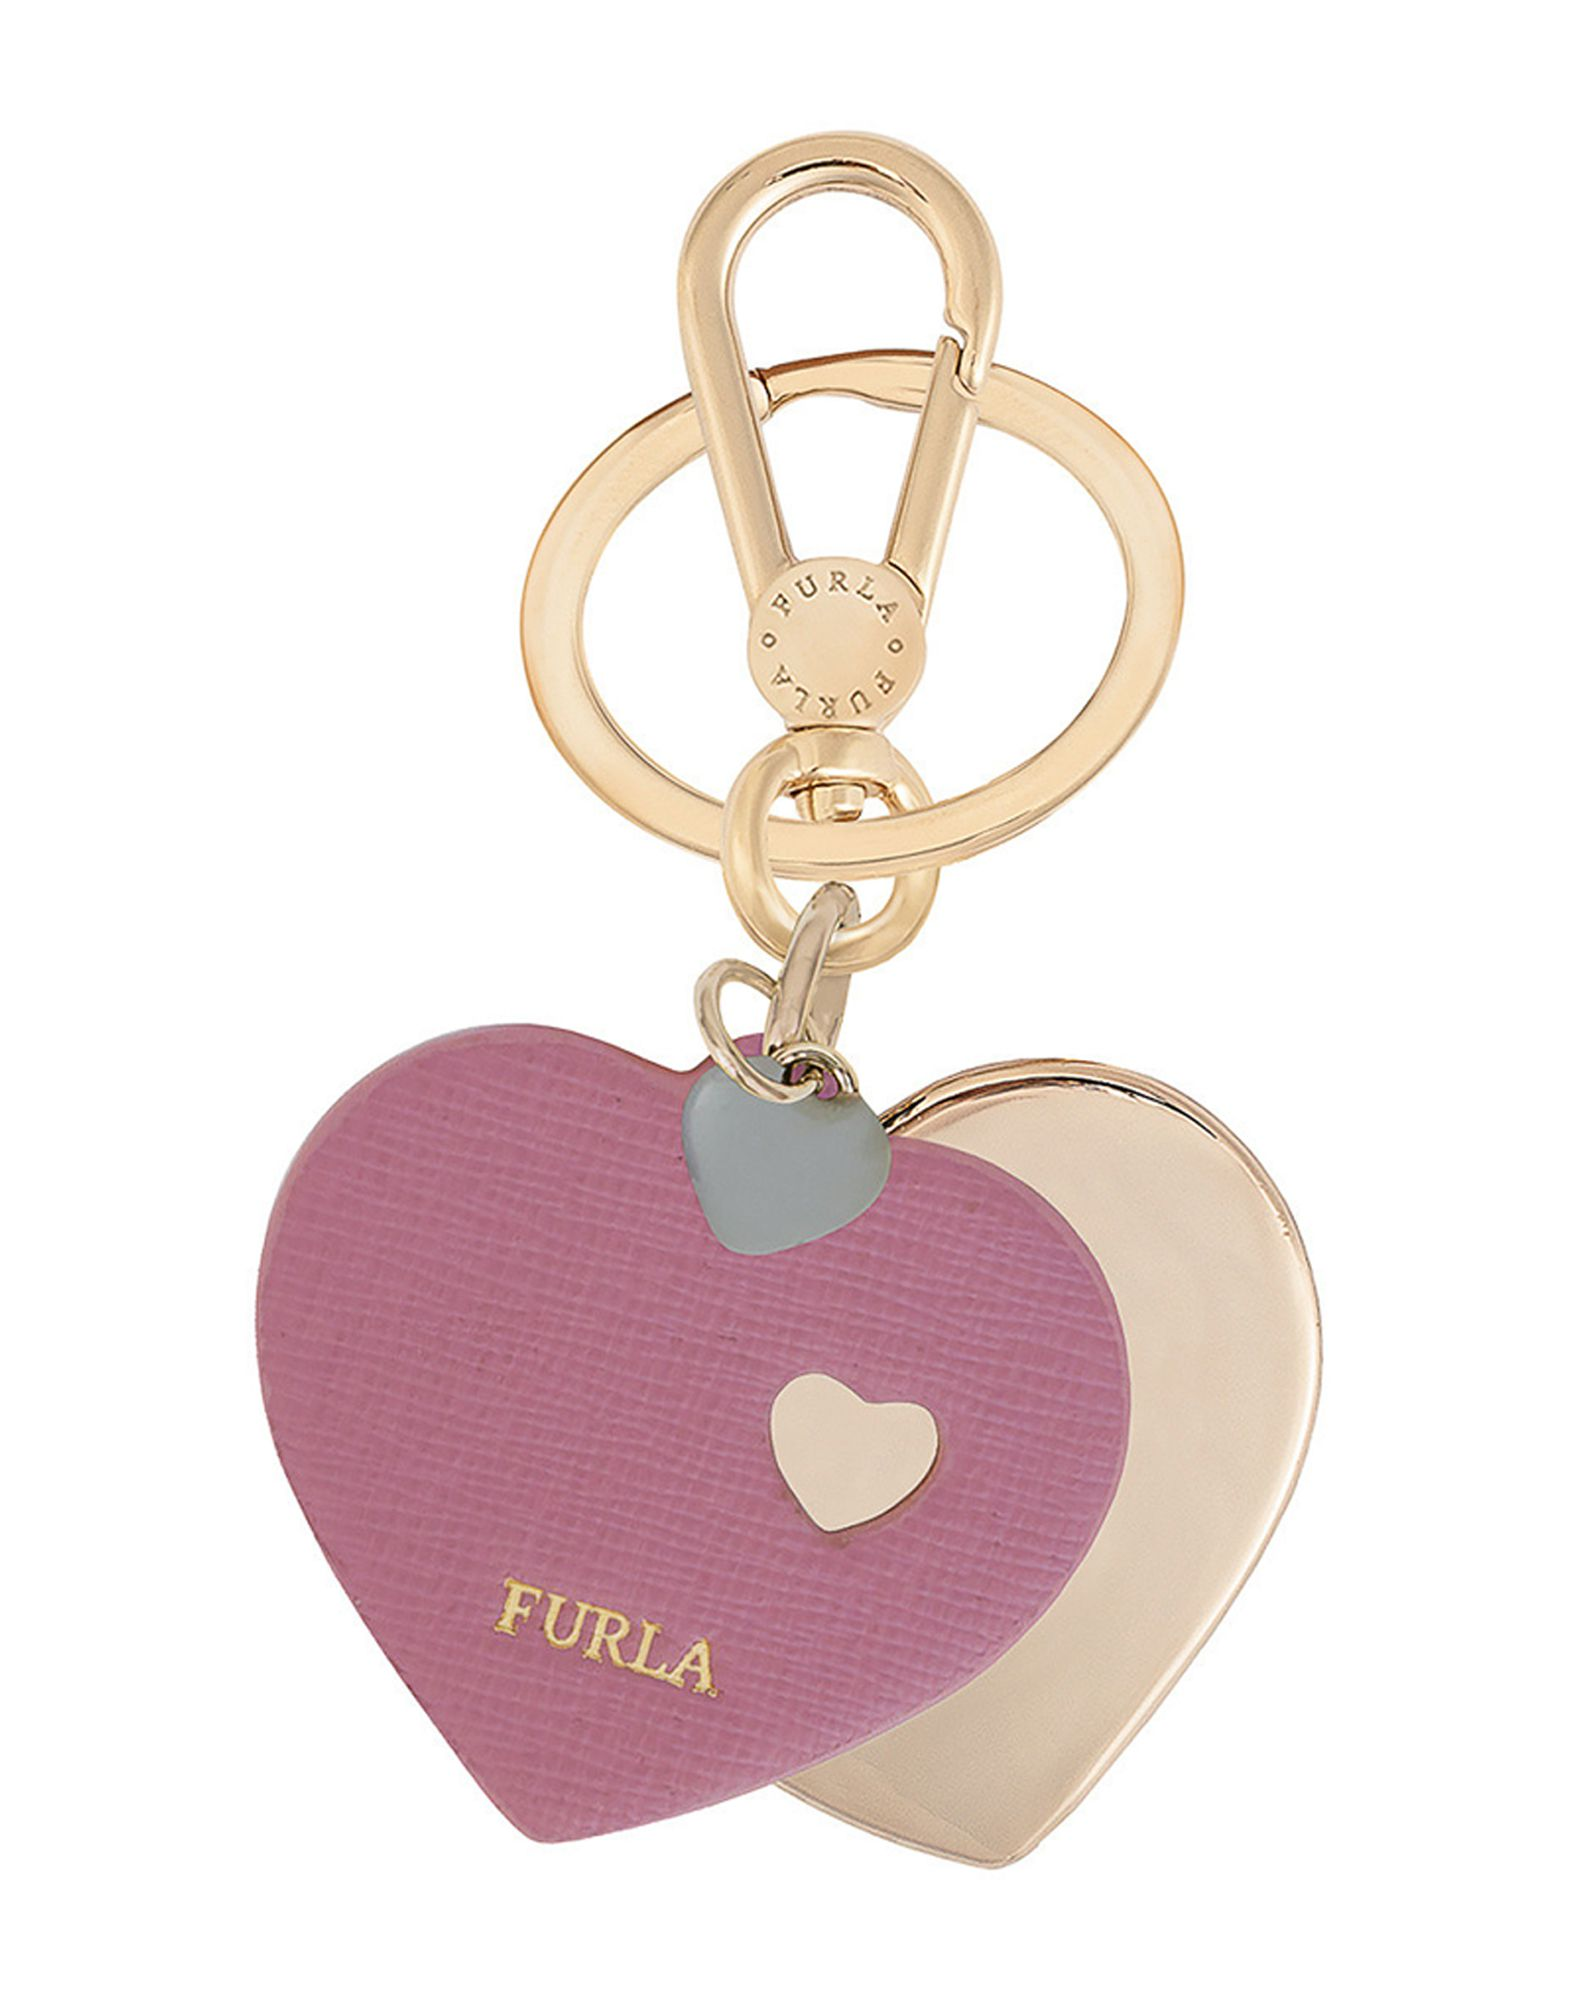 9f070f6707da フルラ(FURLA)ファッション キーホルダーの通販比較 - 価格.com